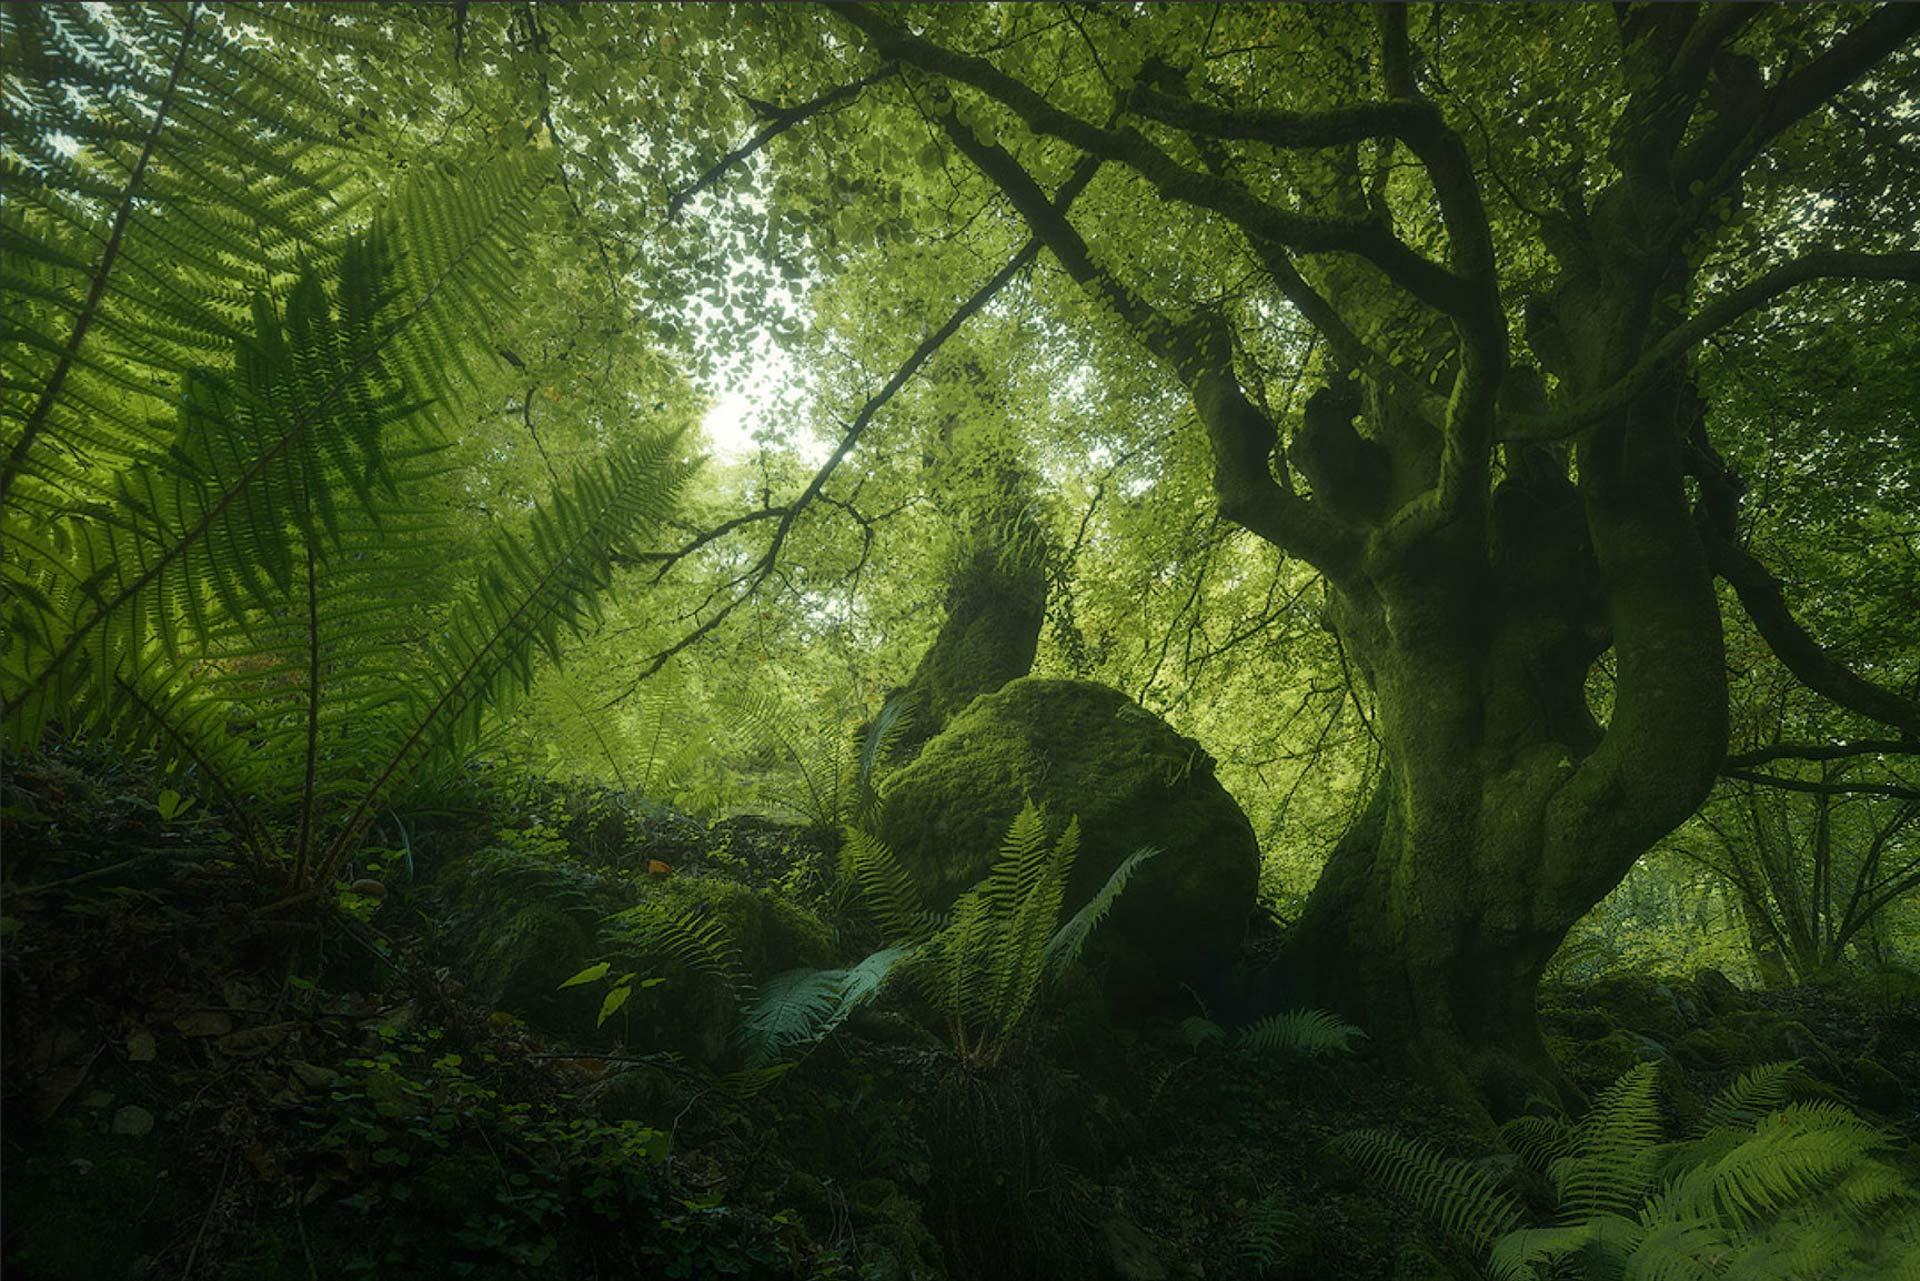 enrico fossati trees